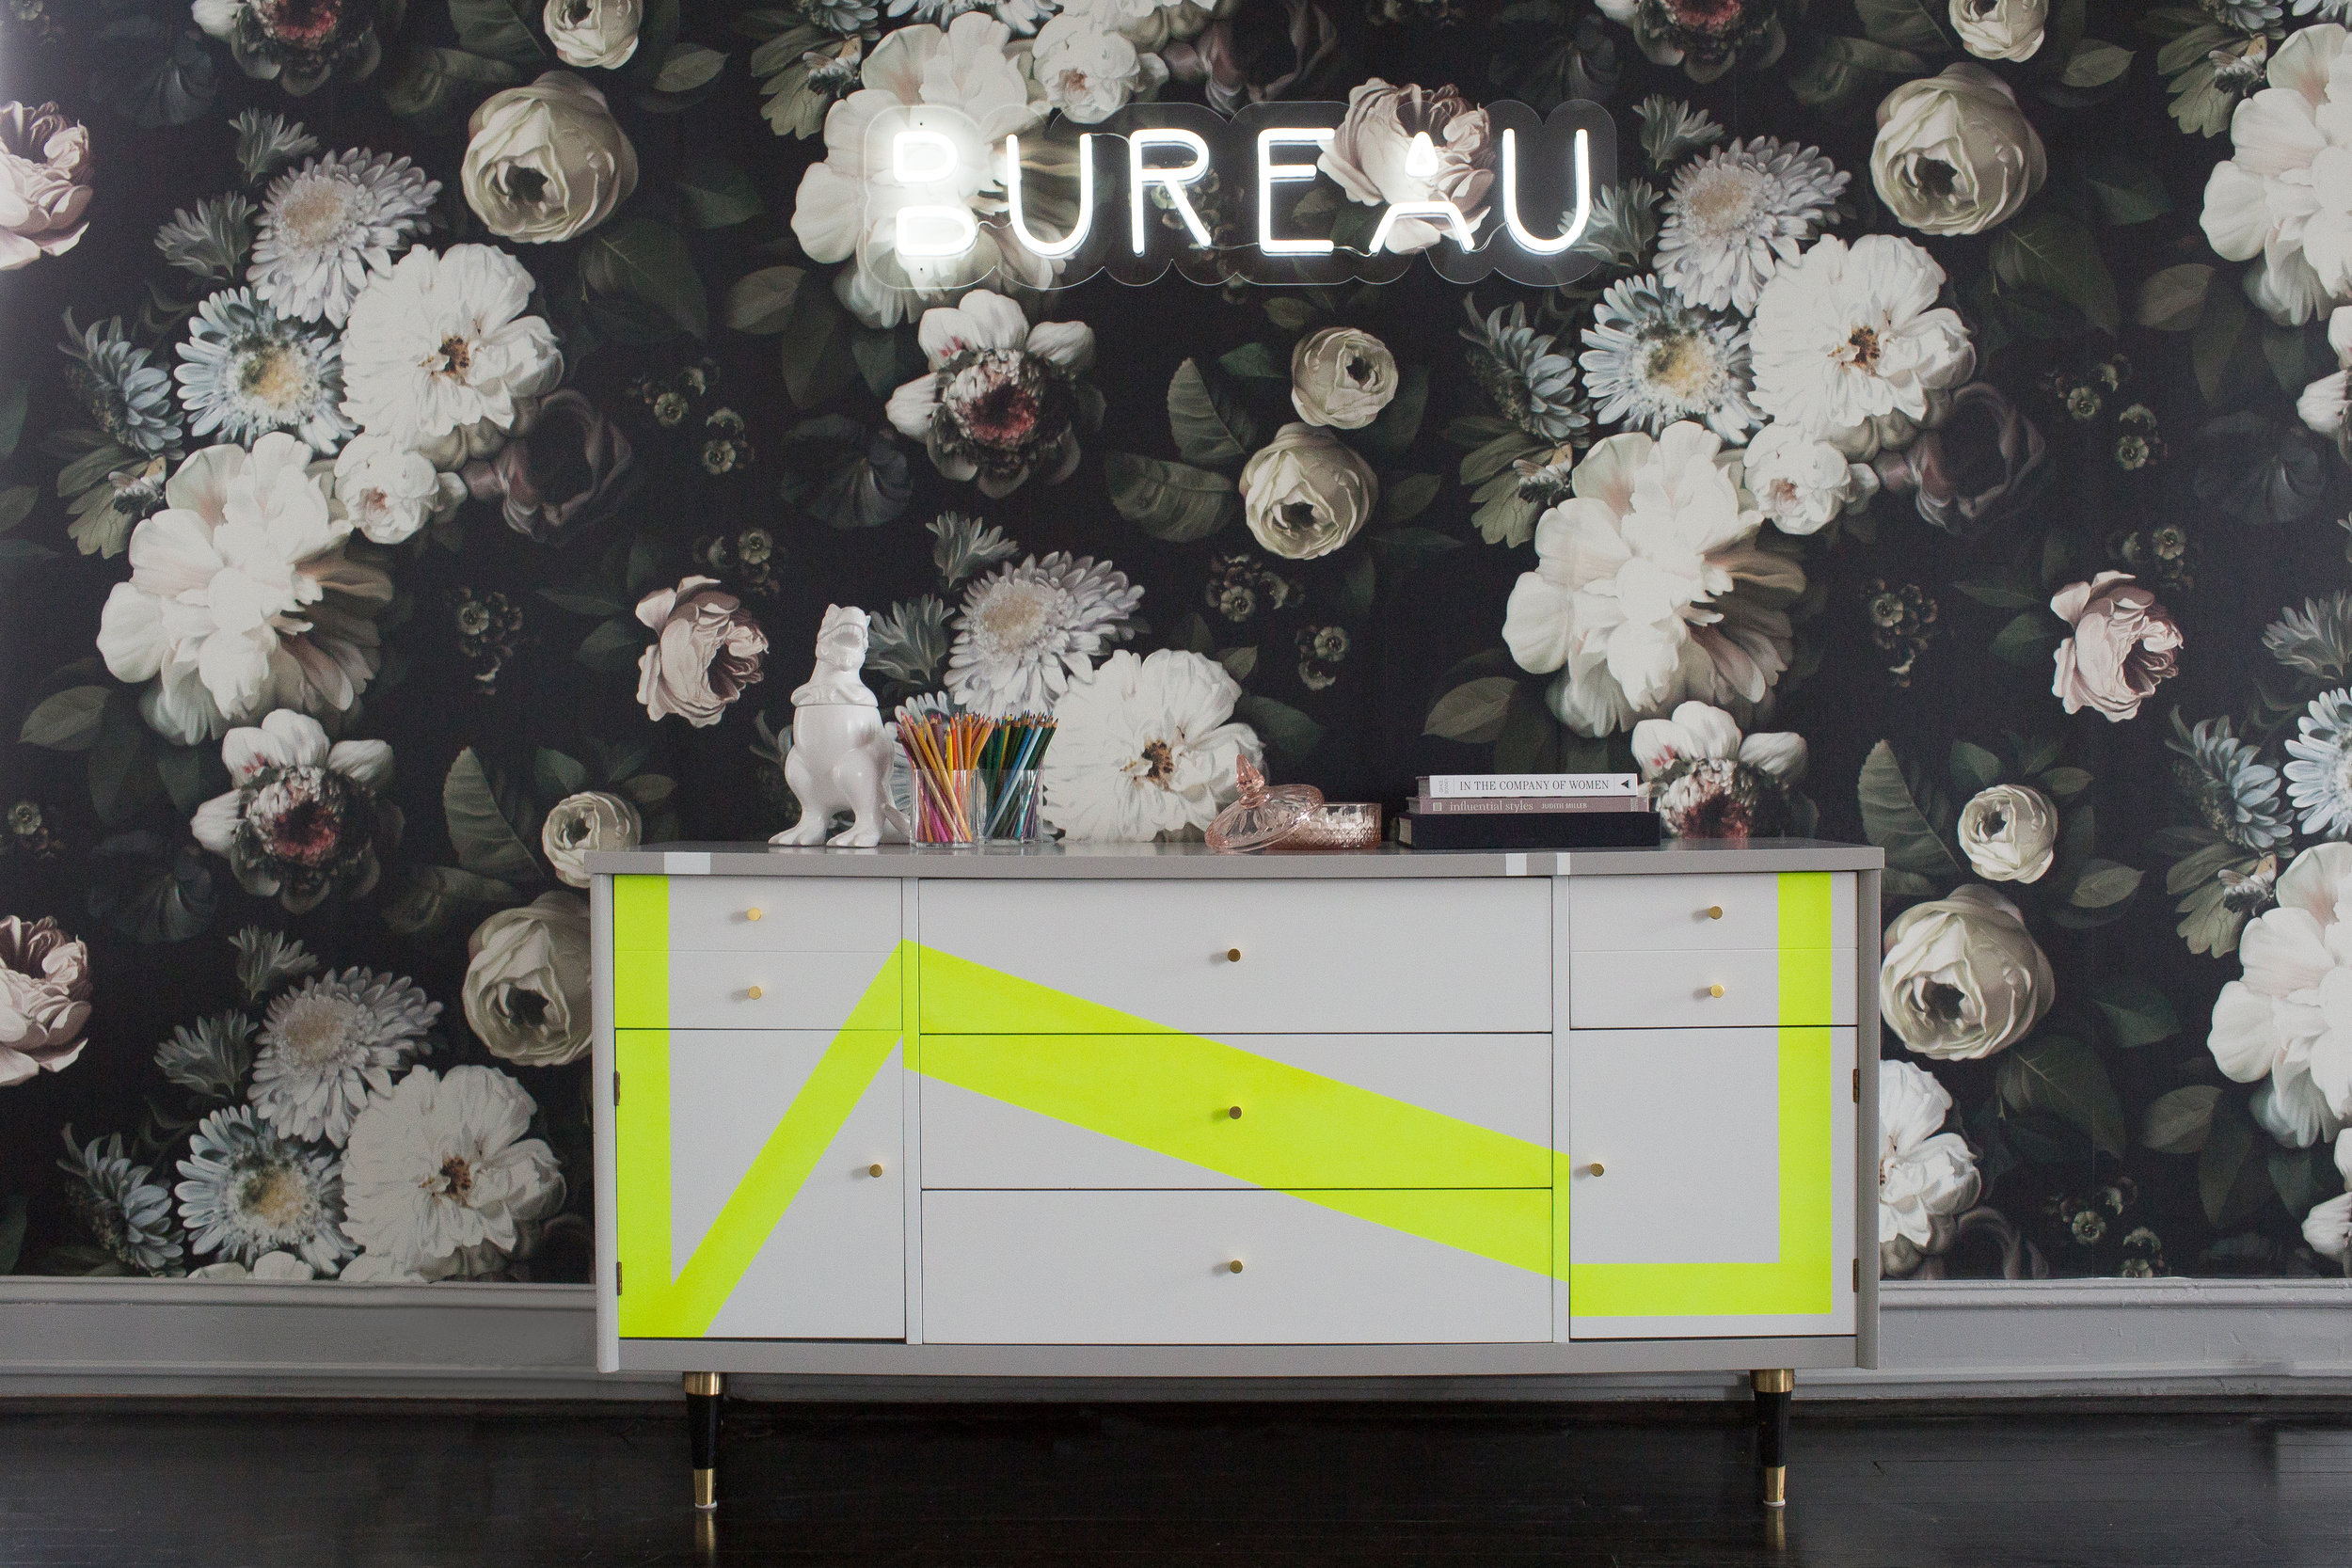 Custom credenza for    Bureau Studio    's    workspace.  Bureau Studio is a co-working and event studio based in Washington, DC. Interior Design. Interior Design:  Kerra Michele Interiors  • Photography:  Reema Desai